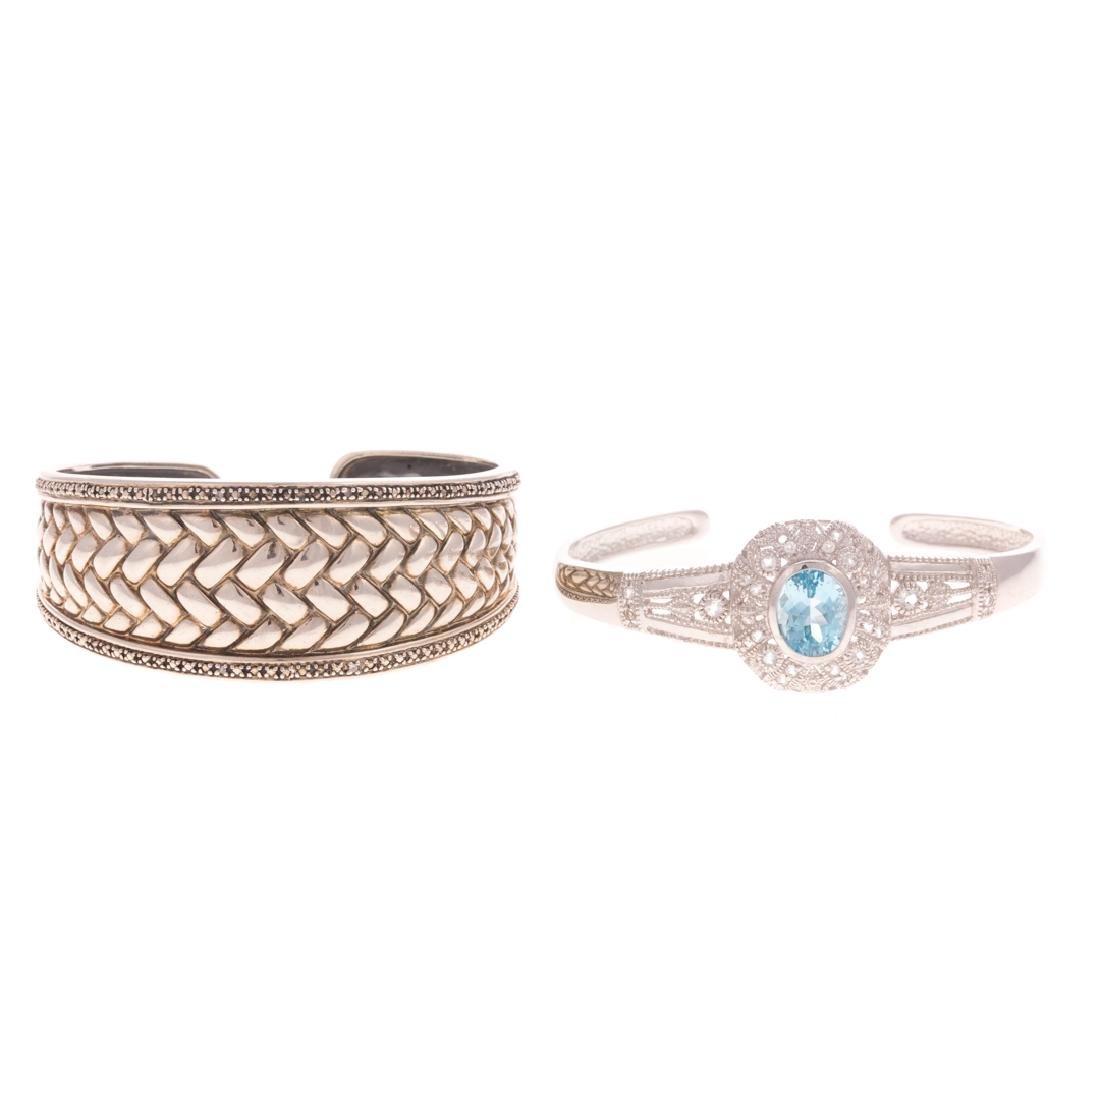 A Pair of Wide Silver Cuff Bracelet